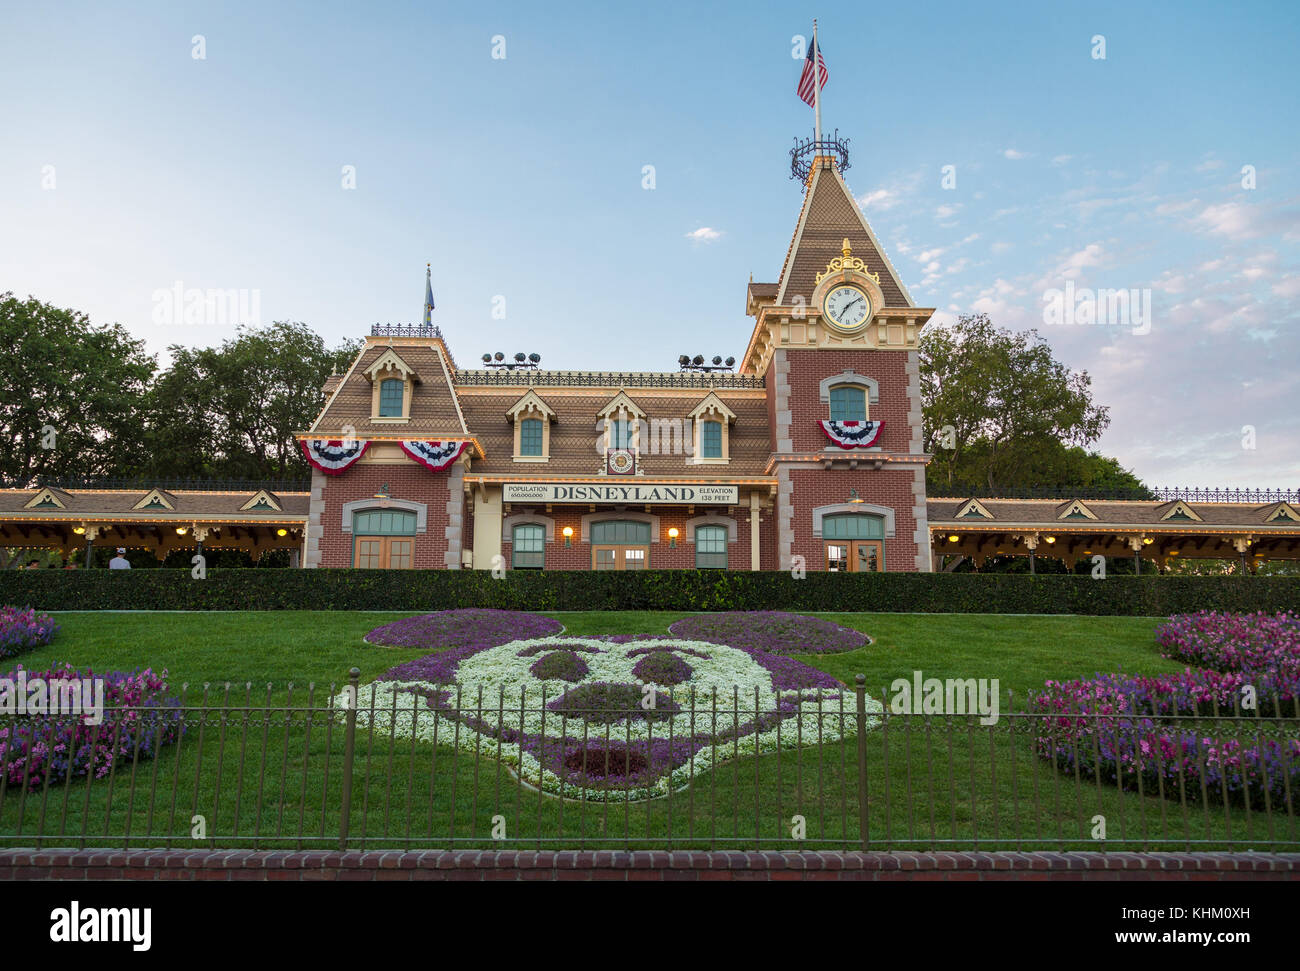 Disneyland anaheim mickey stock photos disneyland for King s fish house anaheim